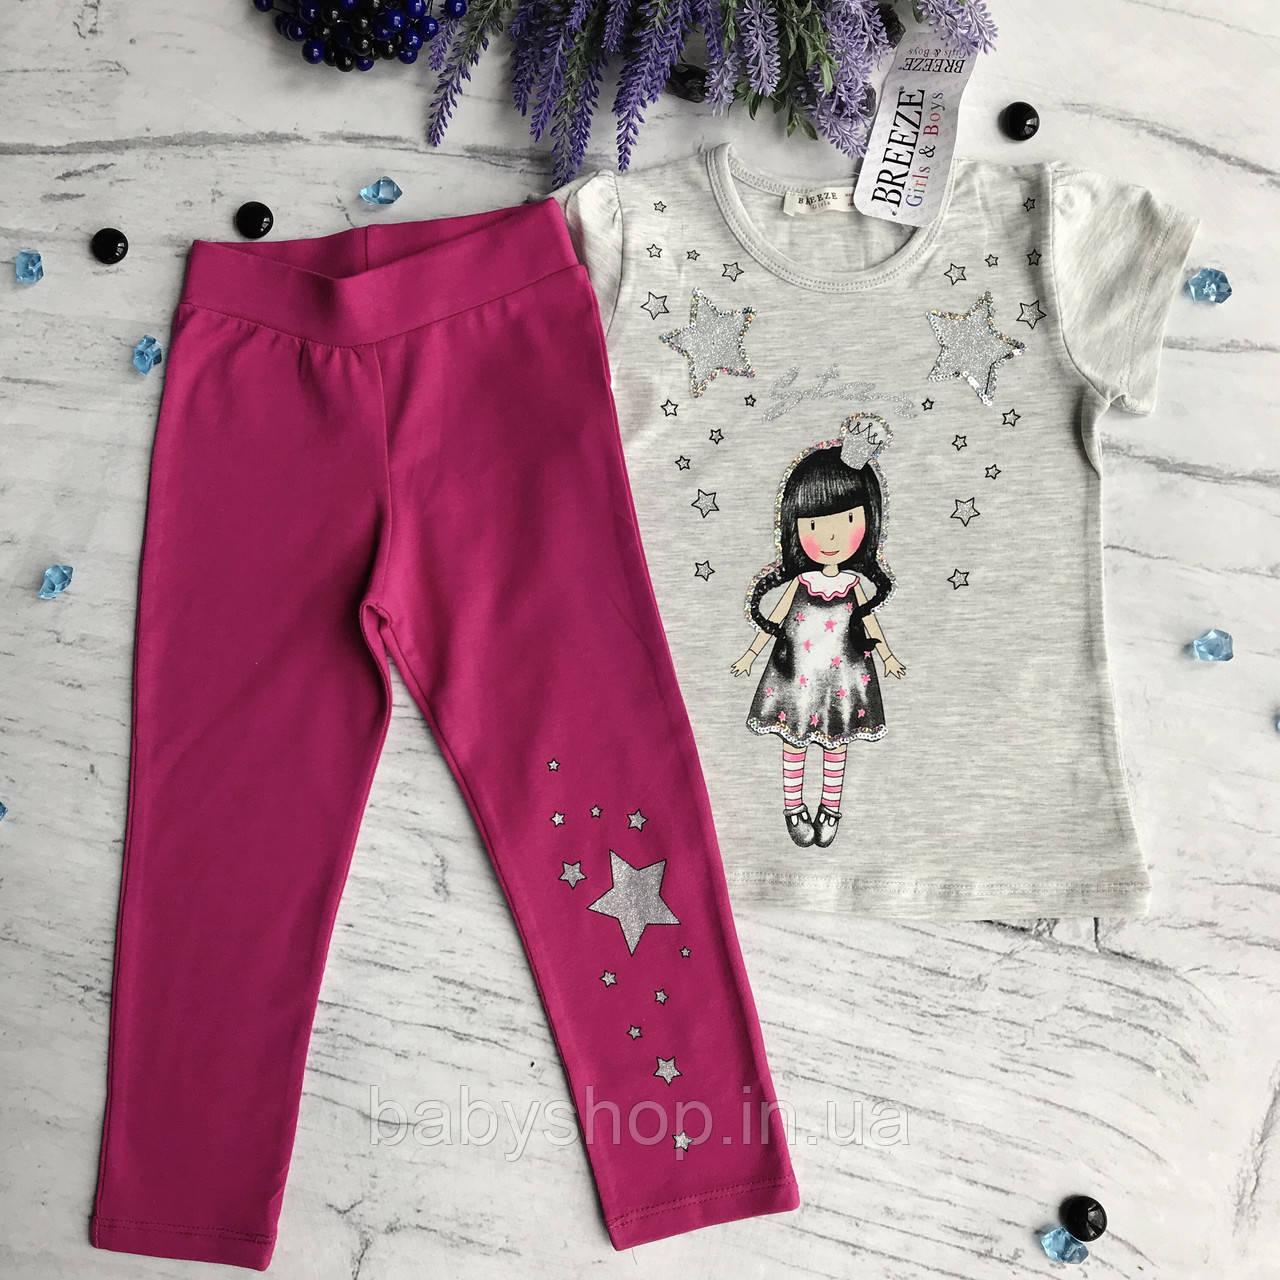 Летний костюм на девочку Breeze 73. Размер 92 см, 98 см, 104 см, 110 см